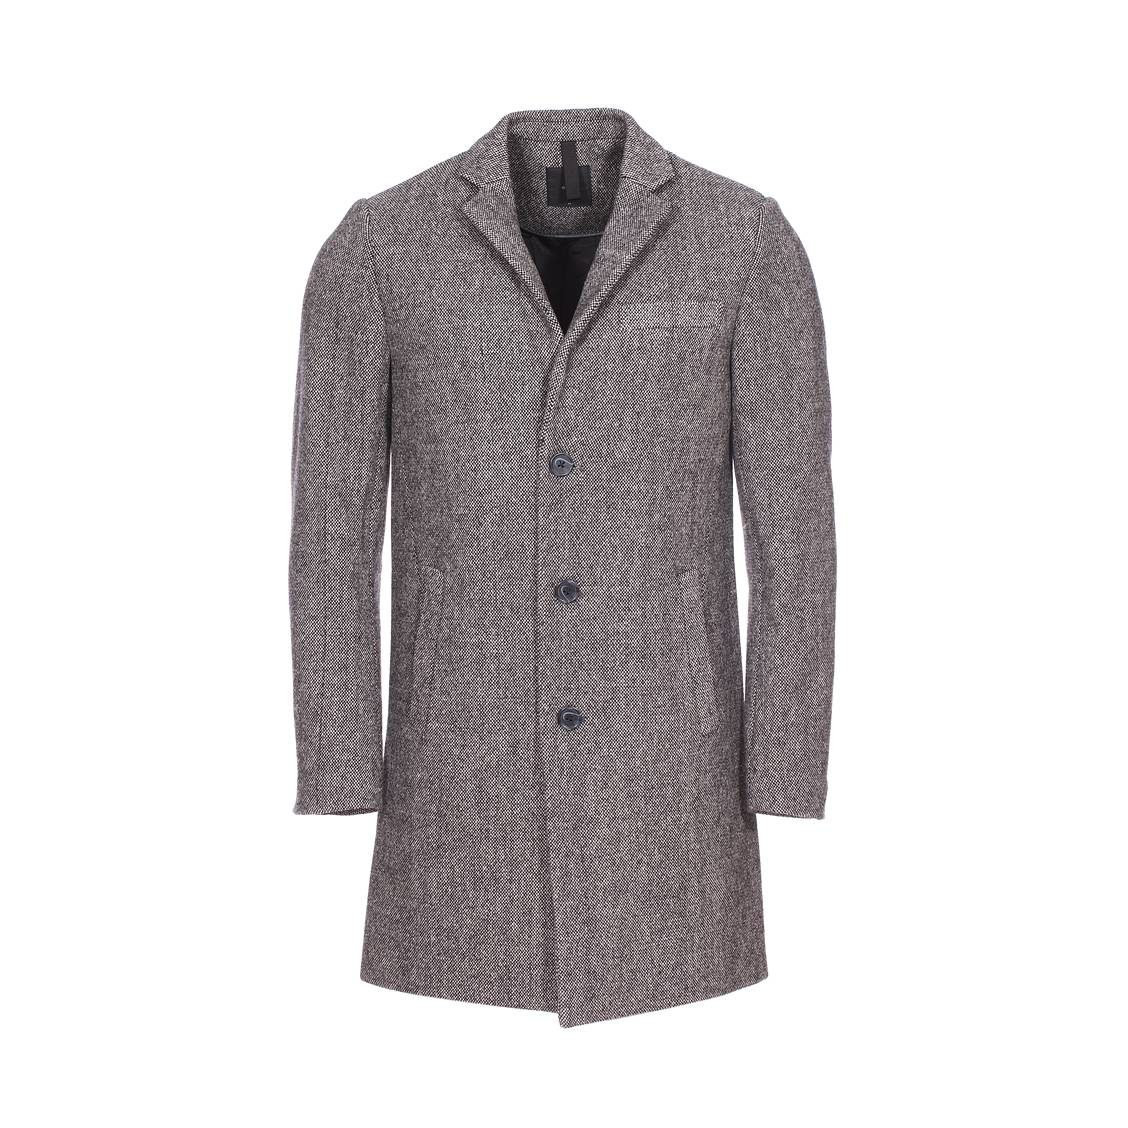 Minimum - manteau, caban, duffle coat